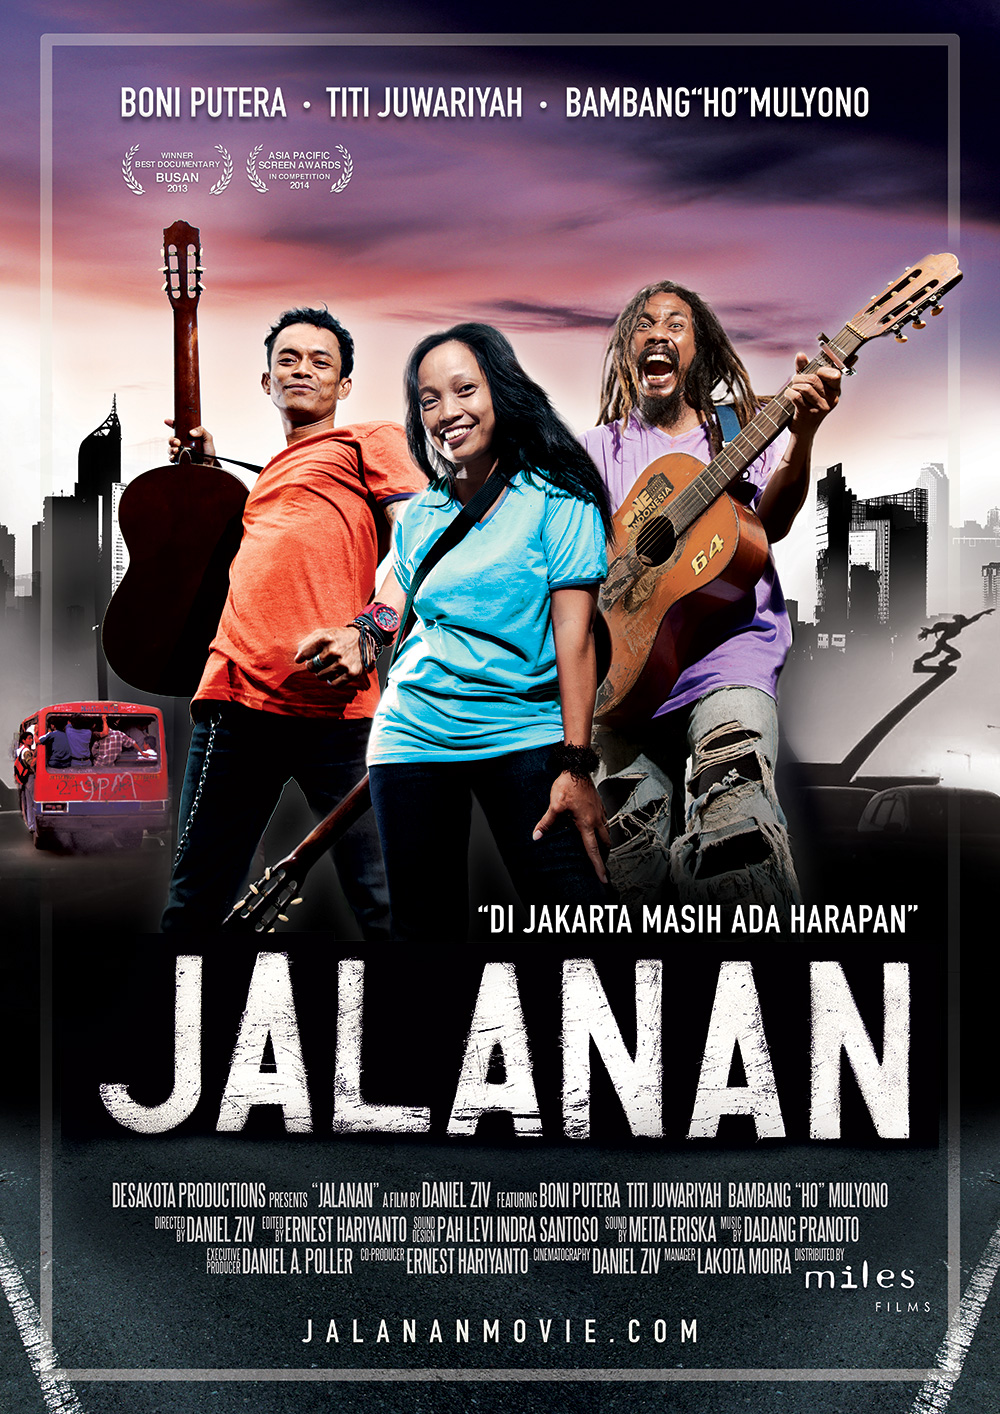 JALANAN official cinema poster